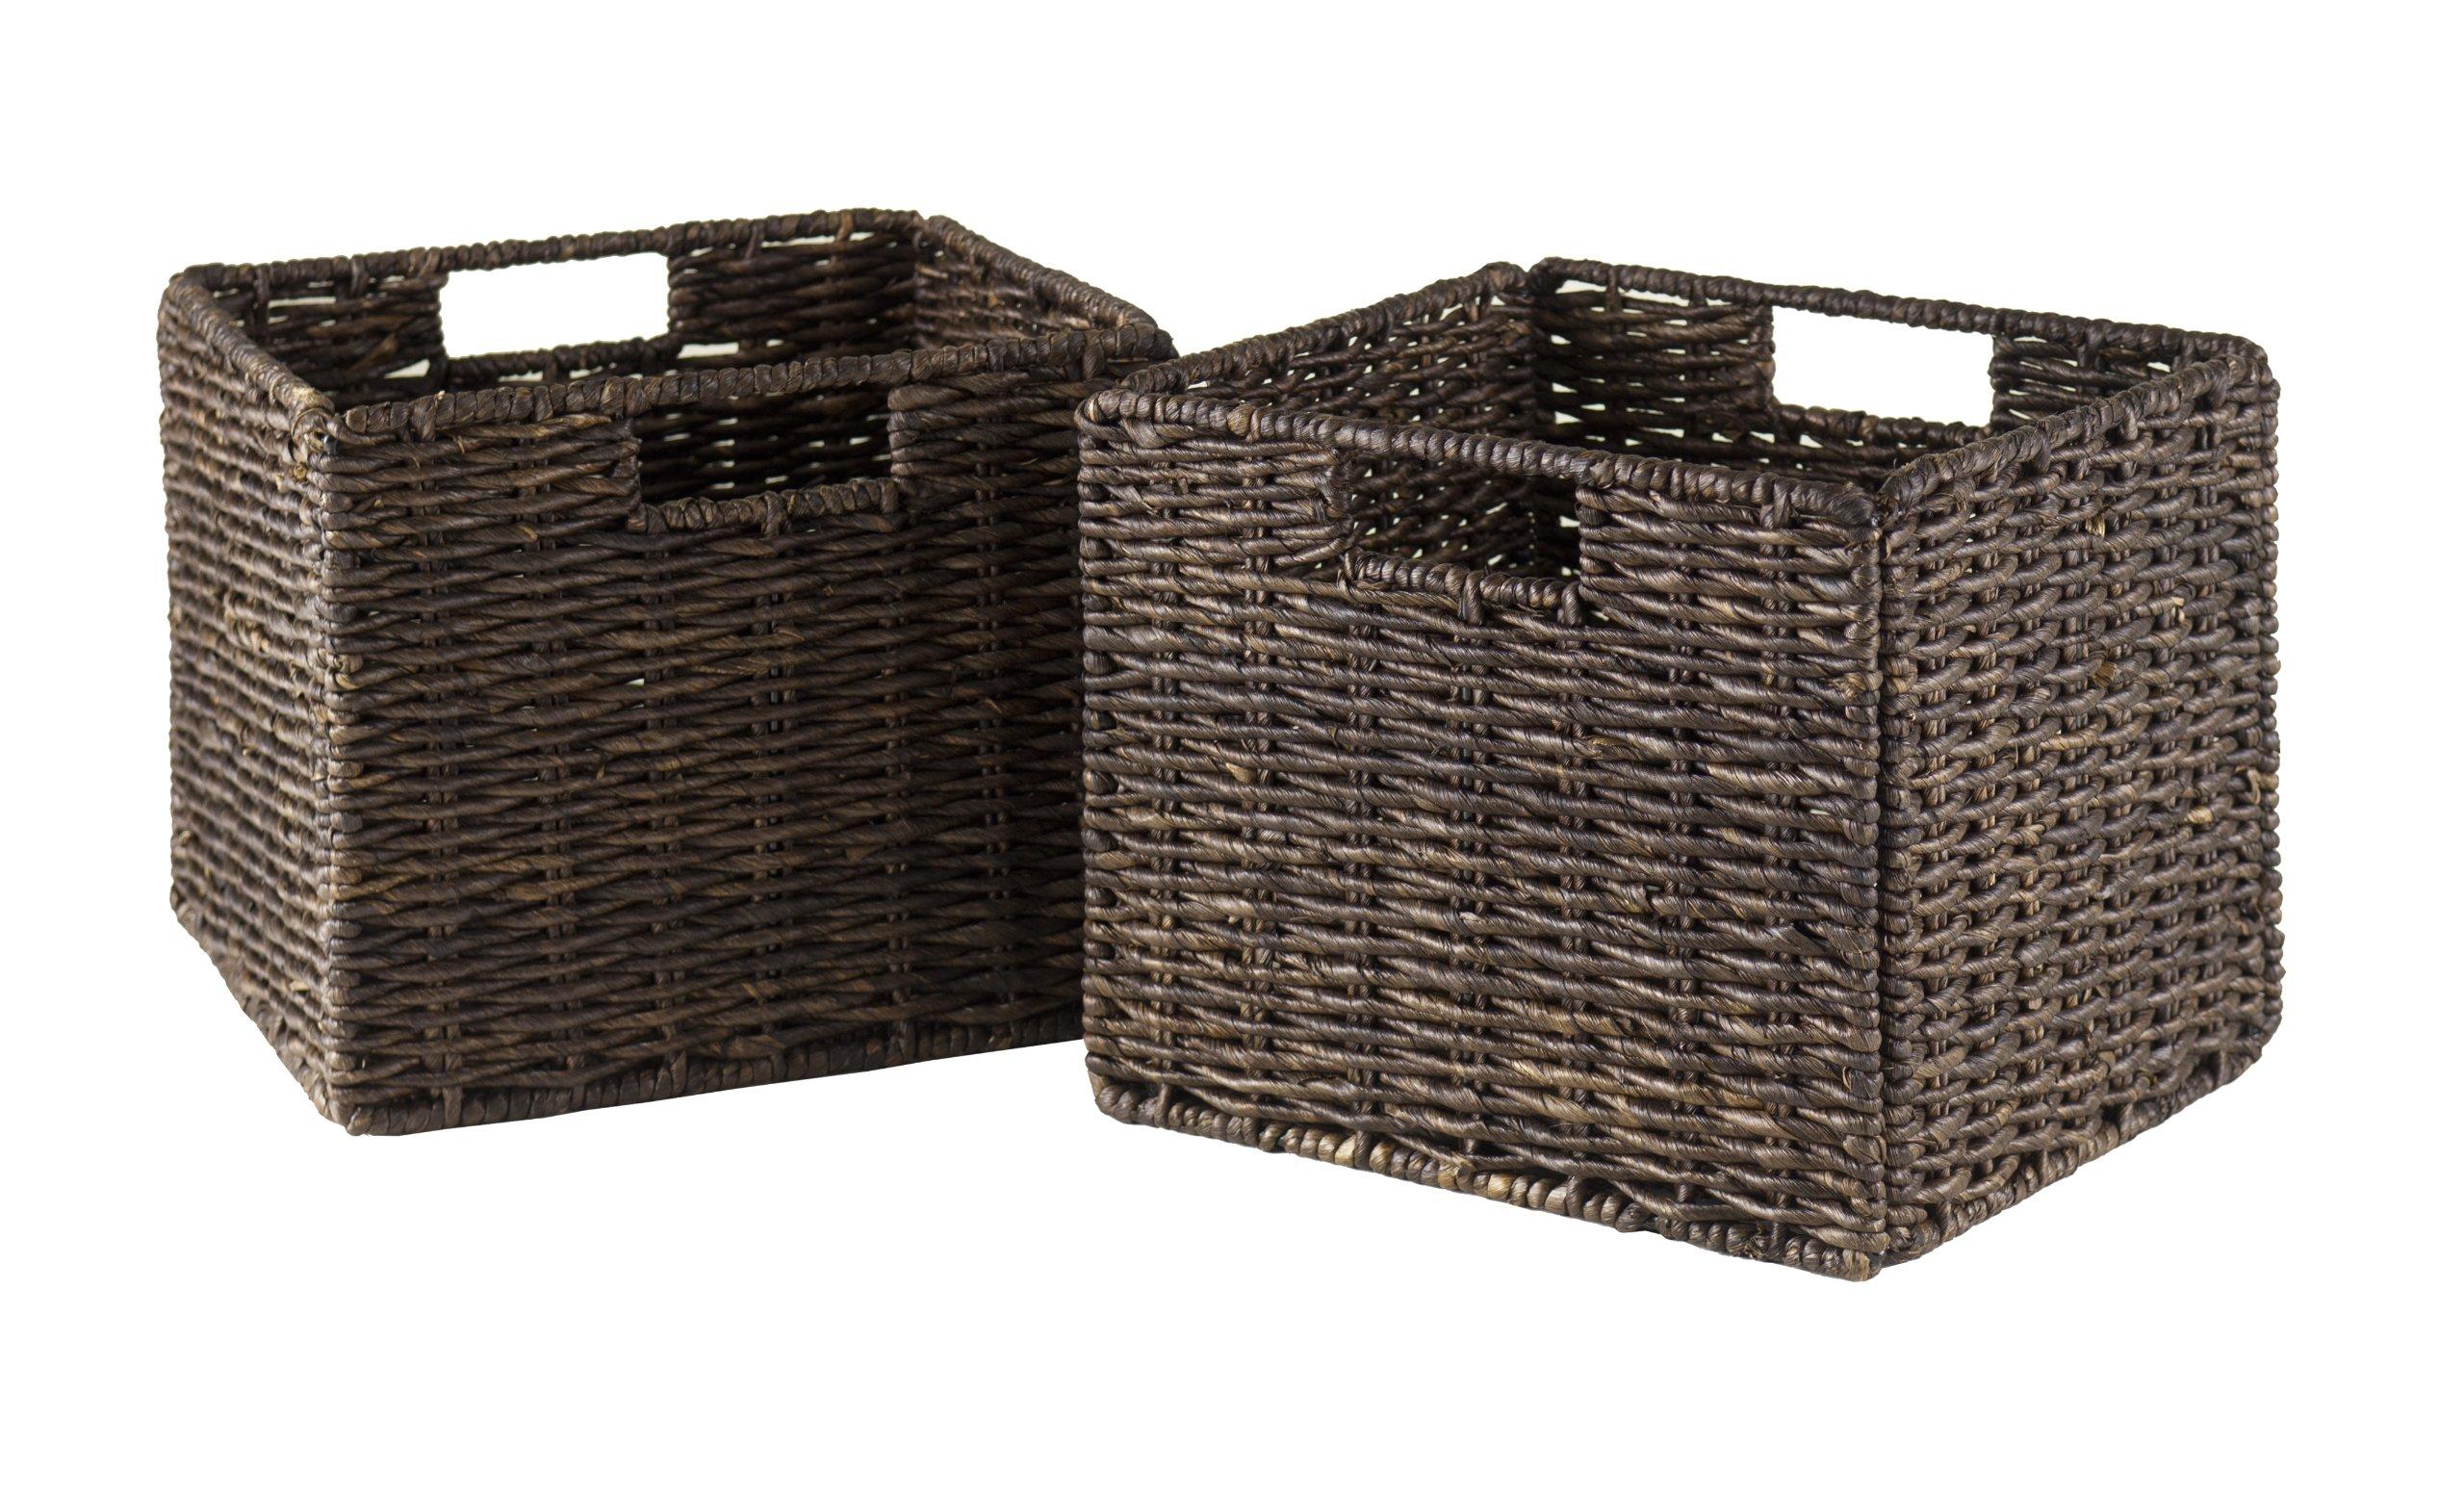 Granville Foldable 2-PC Small Corn Husk Baskets, Chocolate